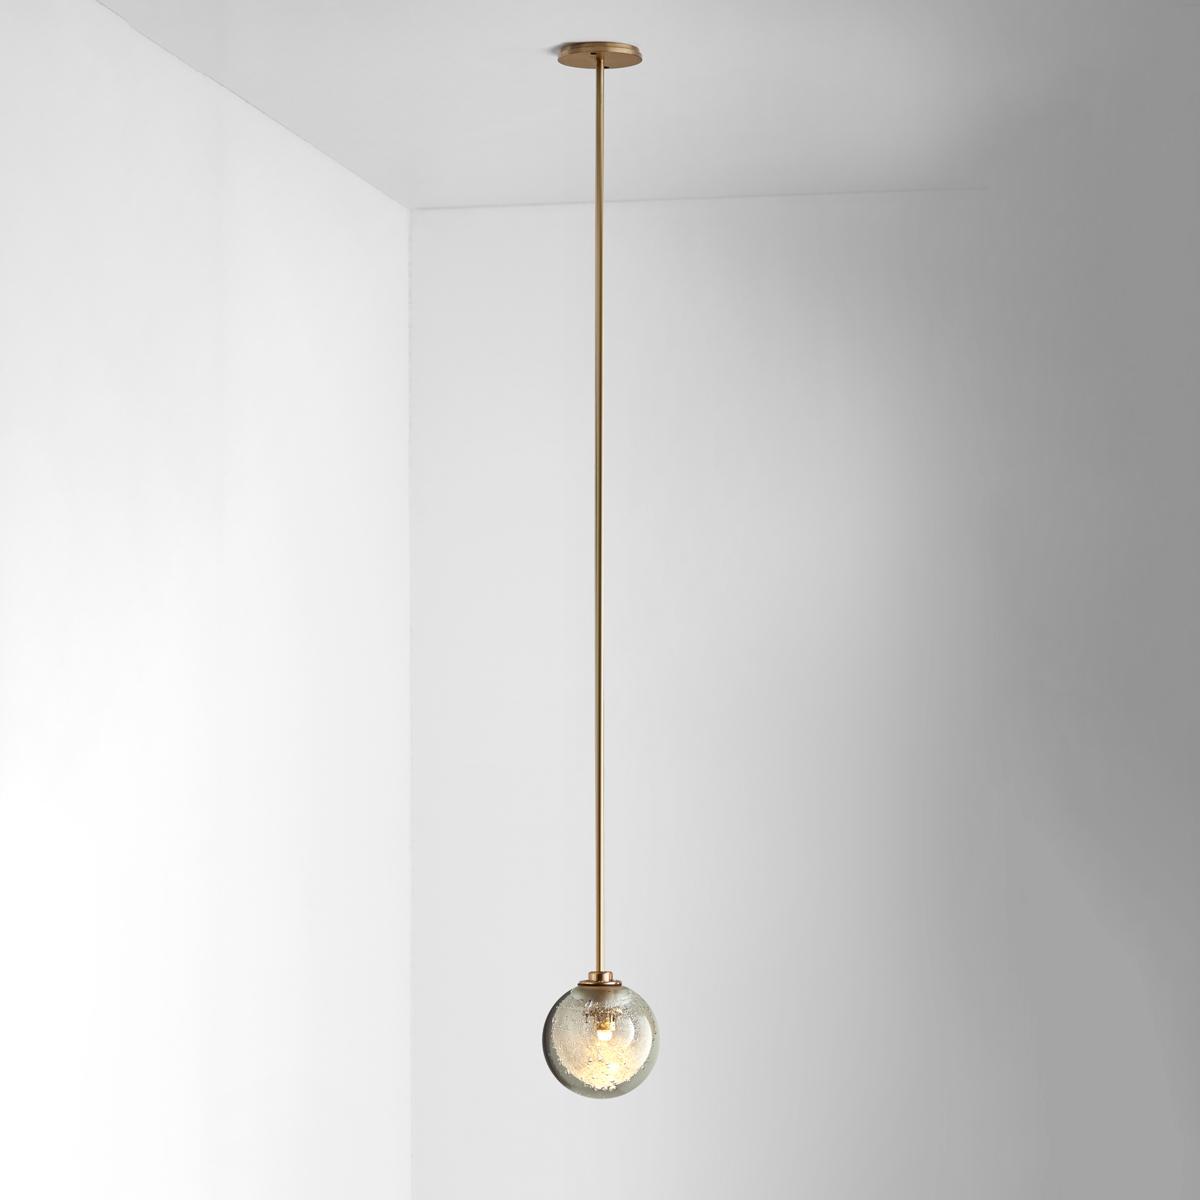 Hero articolo lighting fizi pendant single ball brass rod on